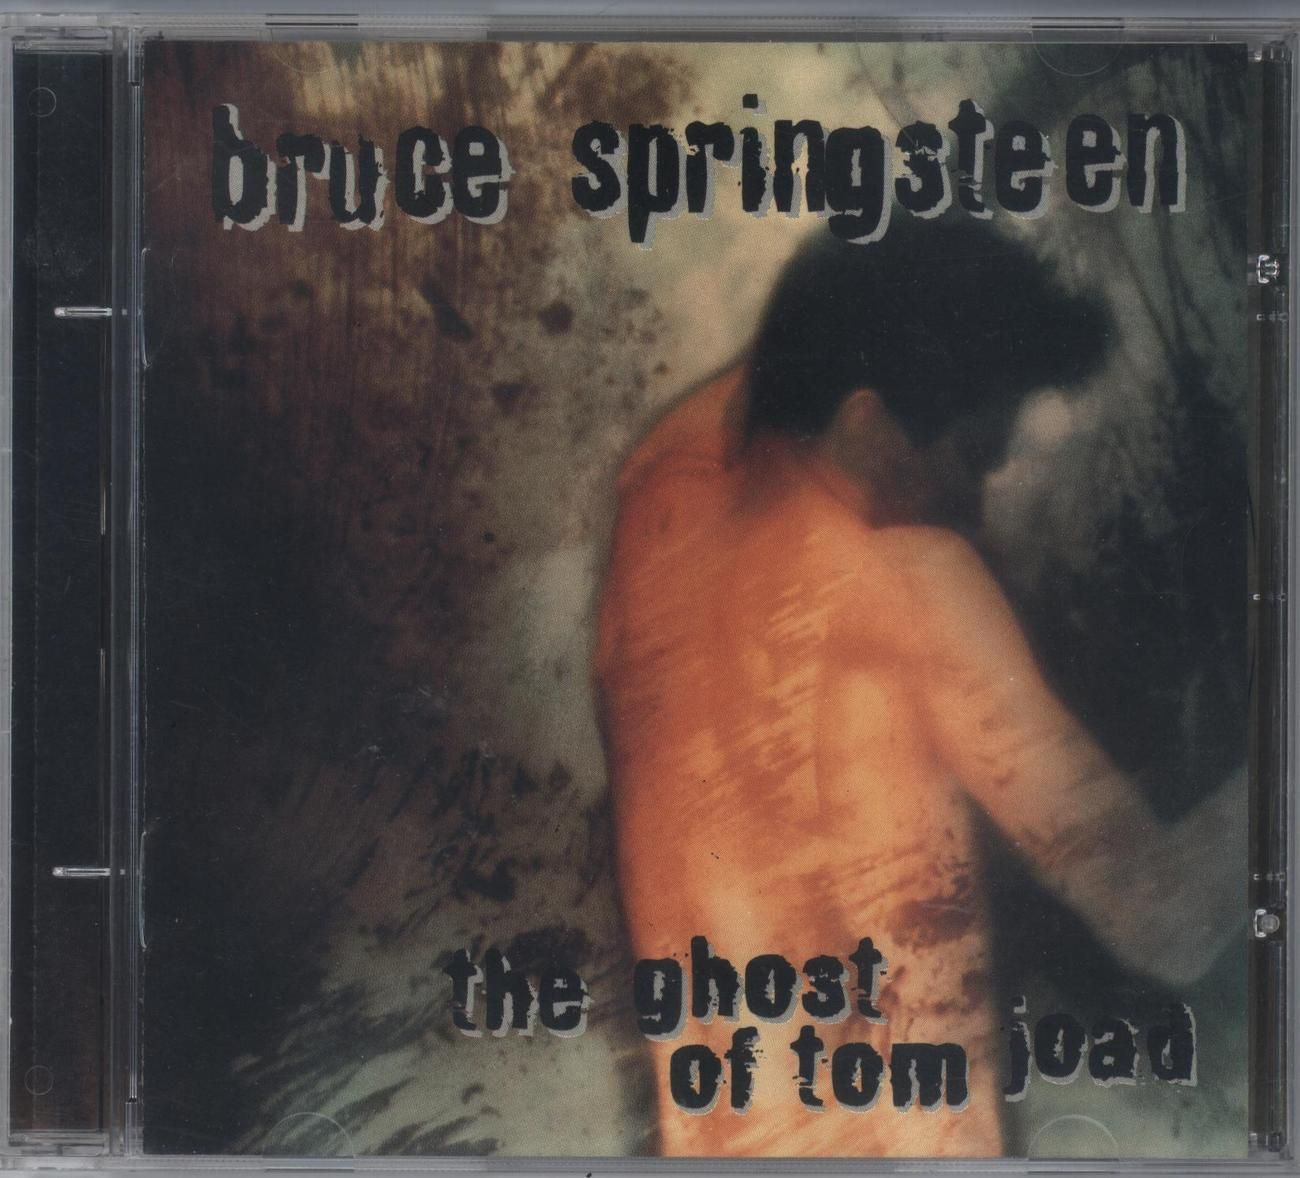 BRUCE SPRINGSTEEN CD The Ghost of Tom Joad